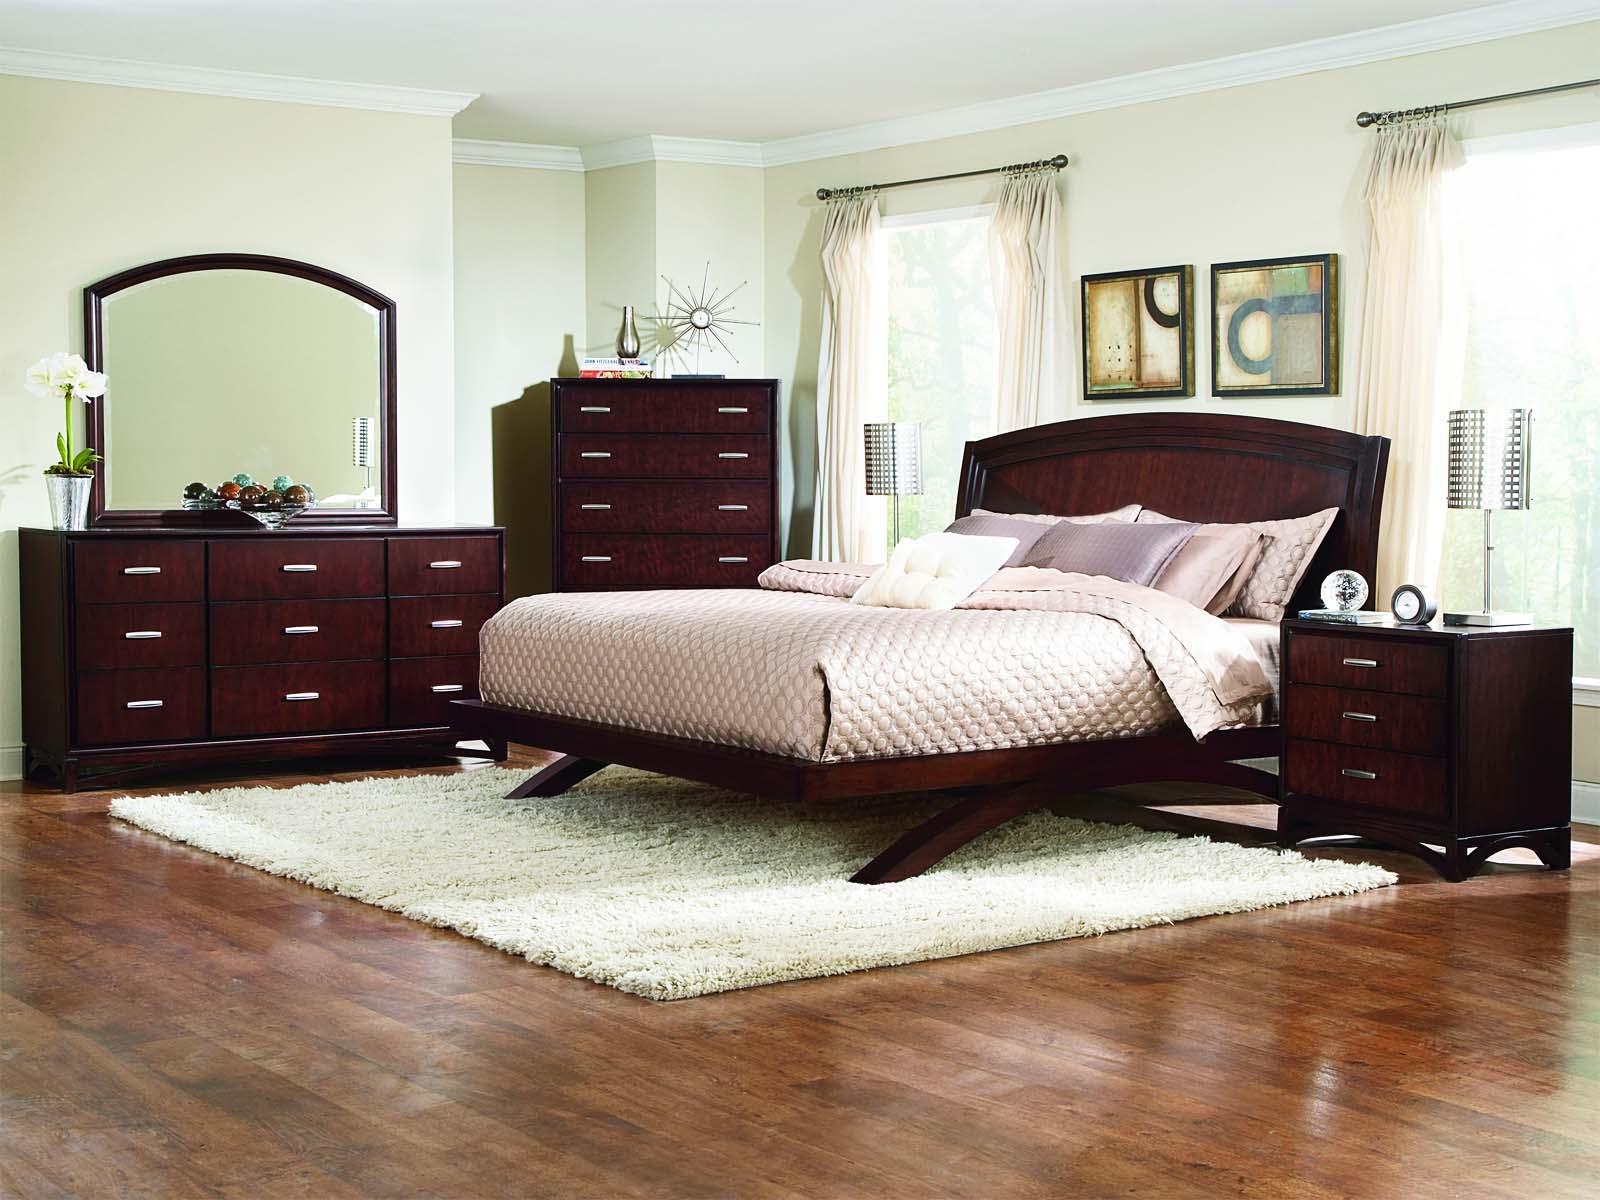 bedroom furniture sets full size photo - 3